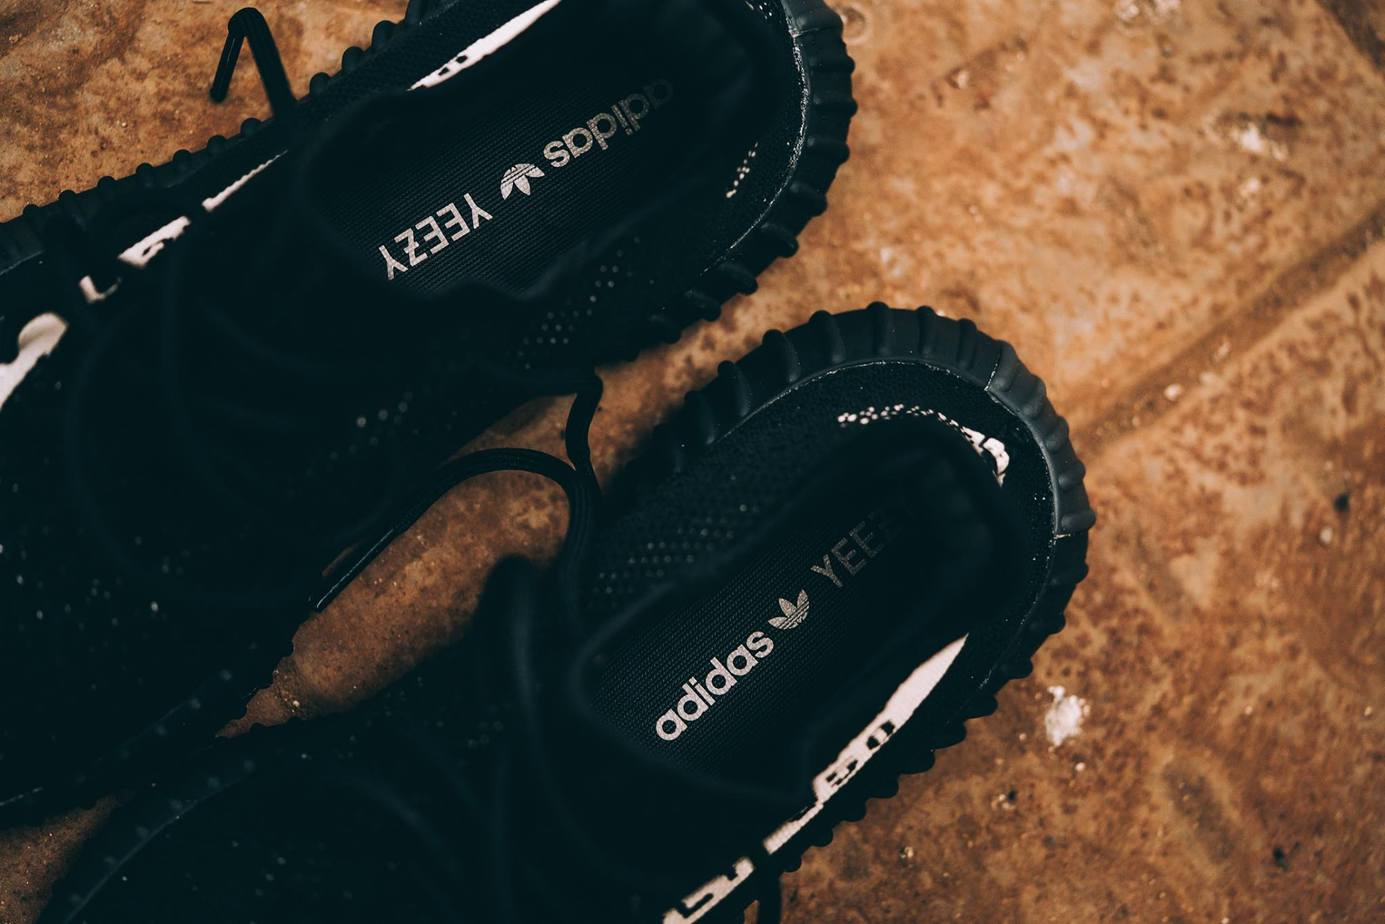 Adidas Yeezy 350 V2 Malasia Precio Ct9HHf